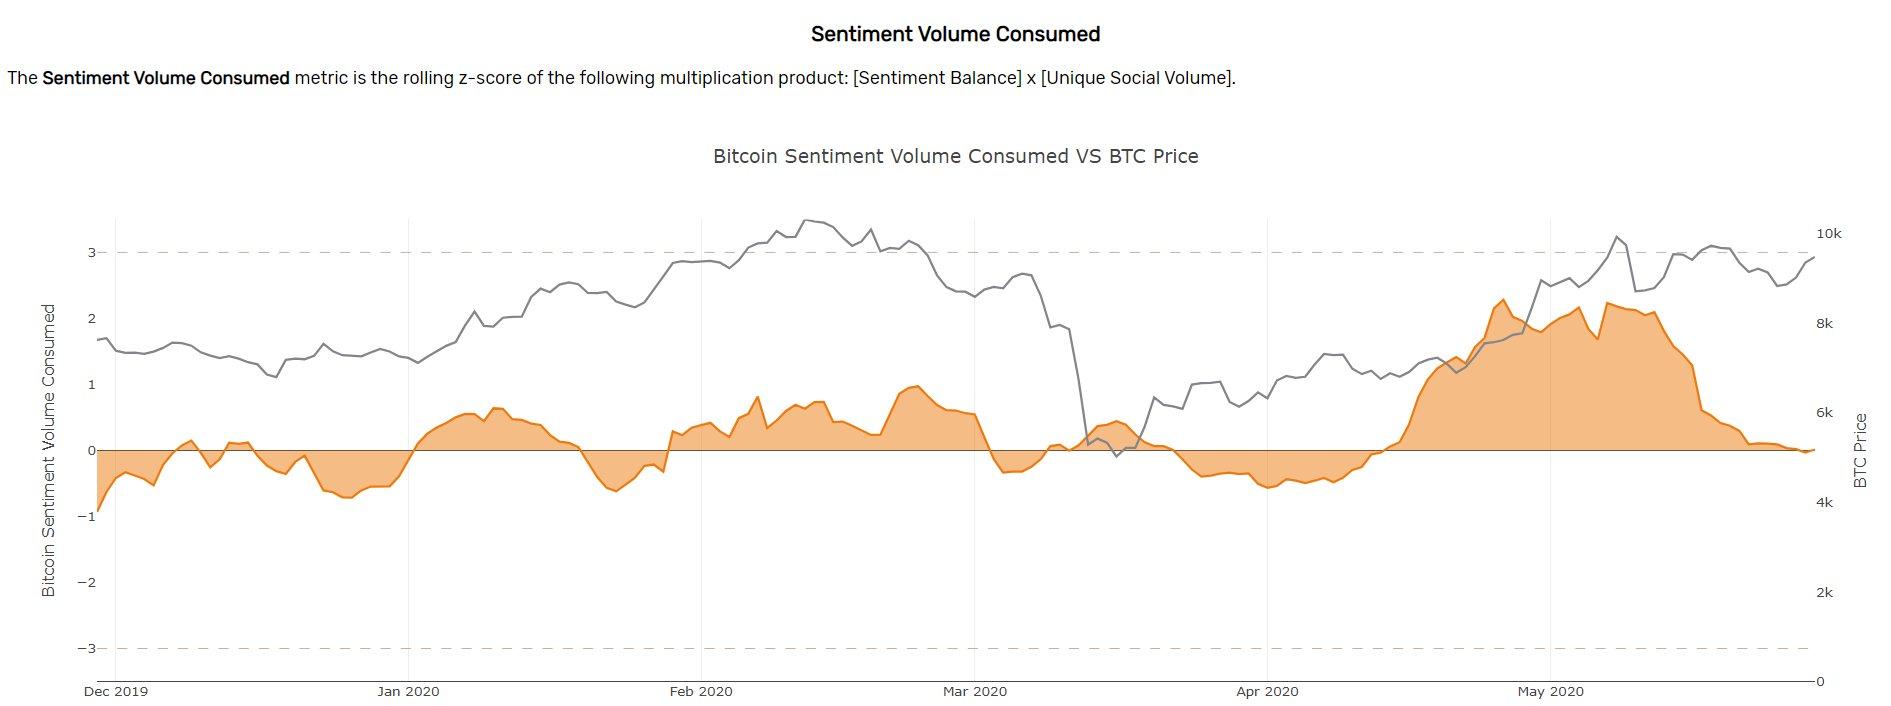 Bitcoin's Twitter Sentiment Volume Consumed. (Source: Santiment)